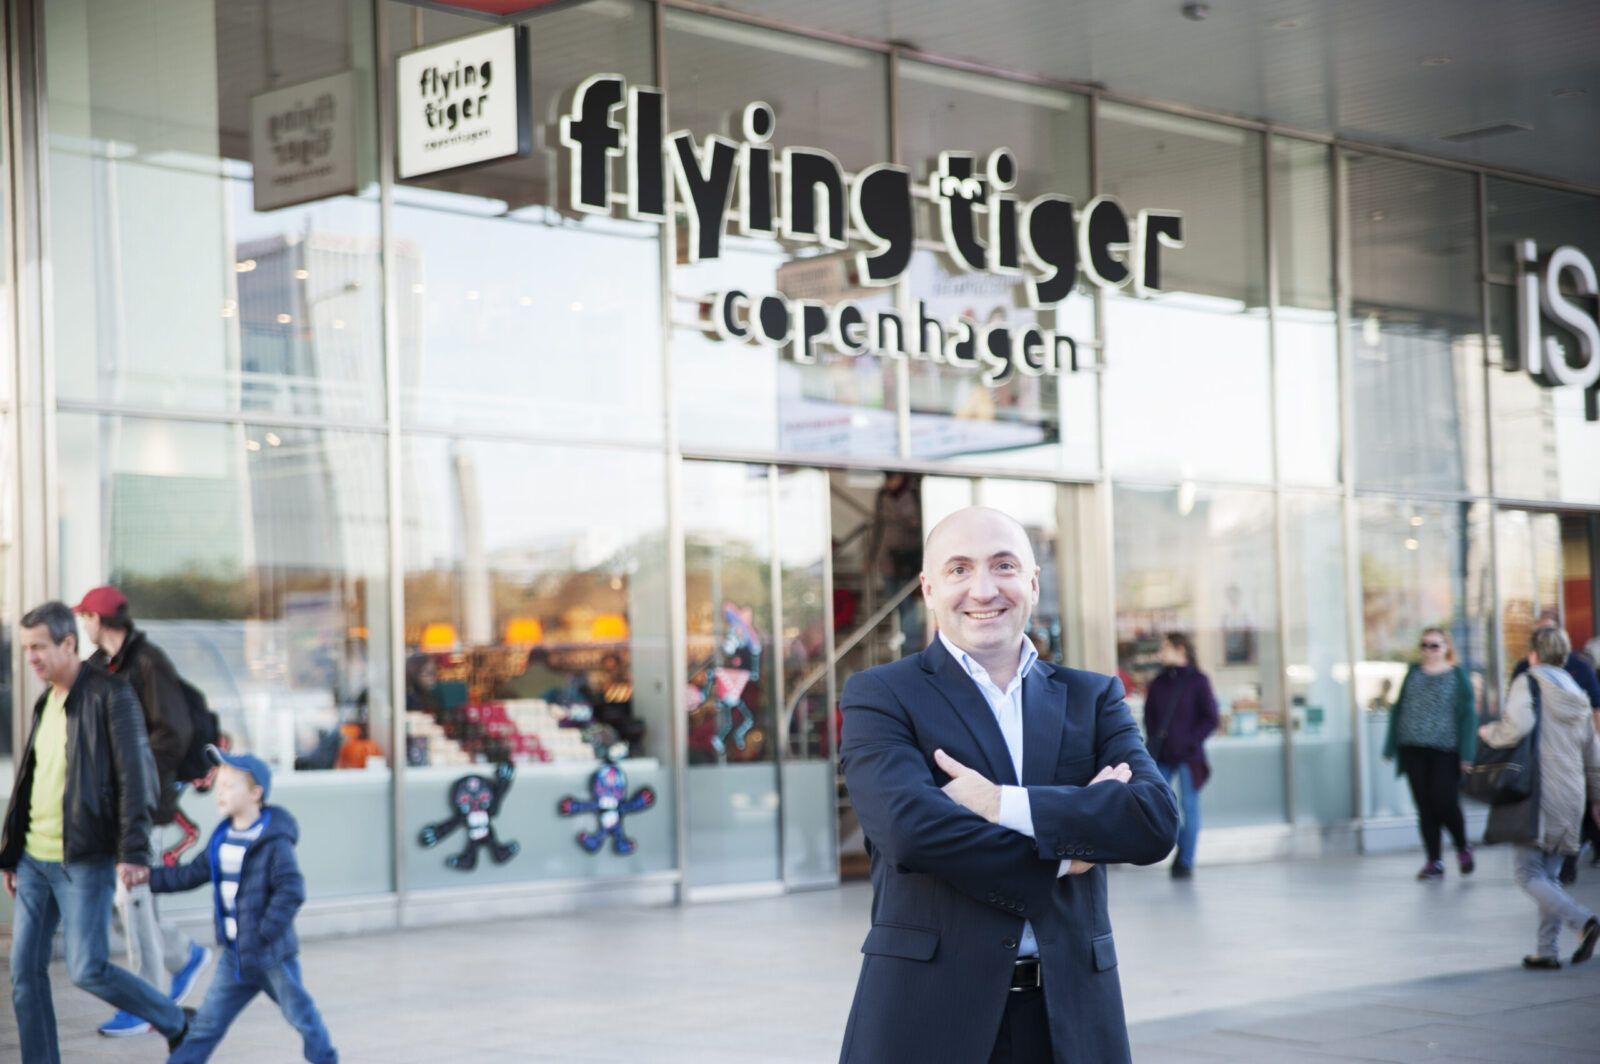 Flying Tiger Copenhagen, czyli jak duńska marka poszerza horyzonty